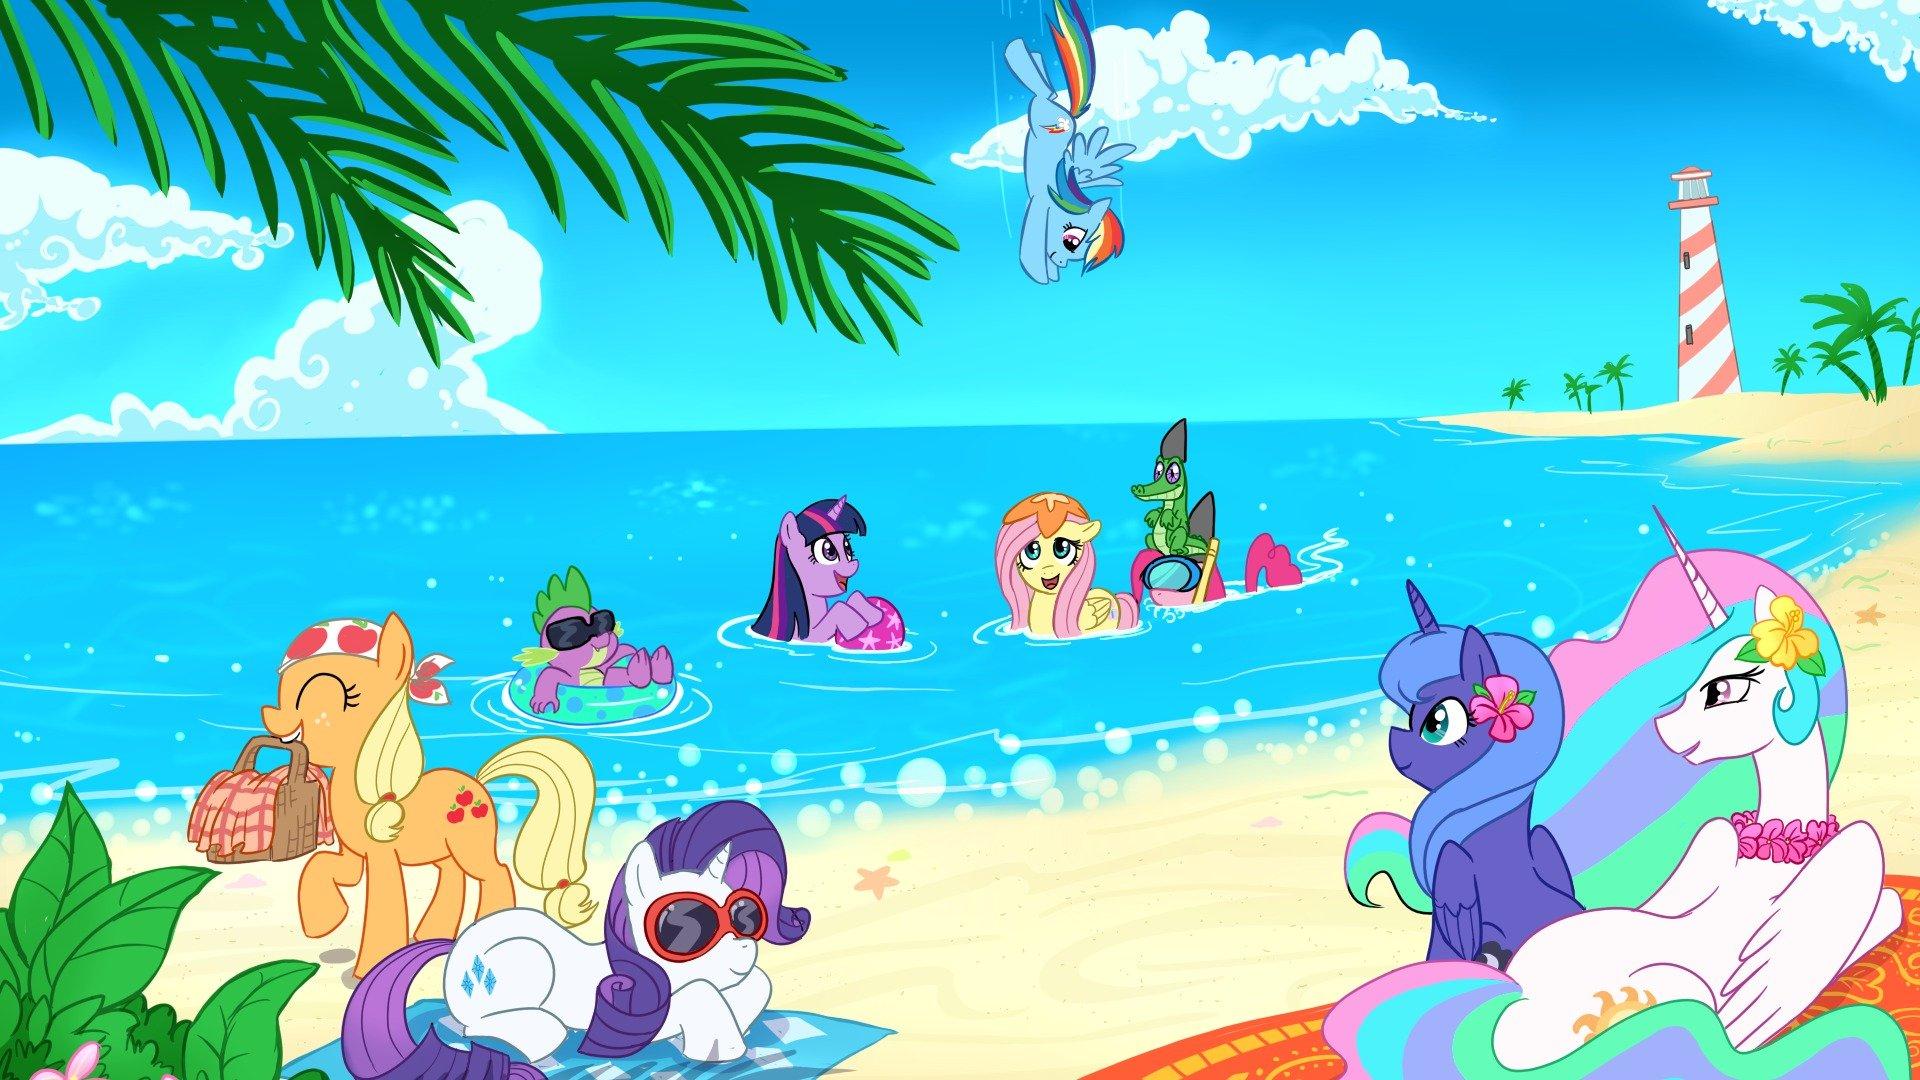 Xbox One X 4k Magic: 4K My Little Pony Wallpapers High Quality